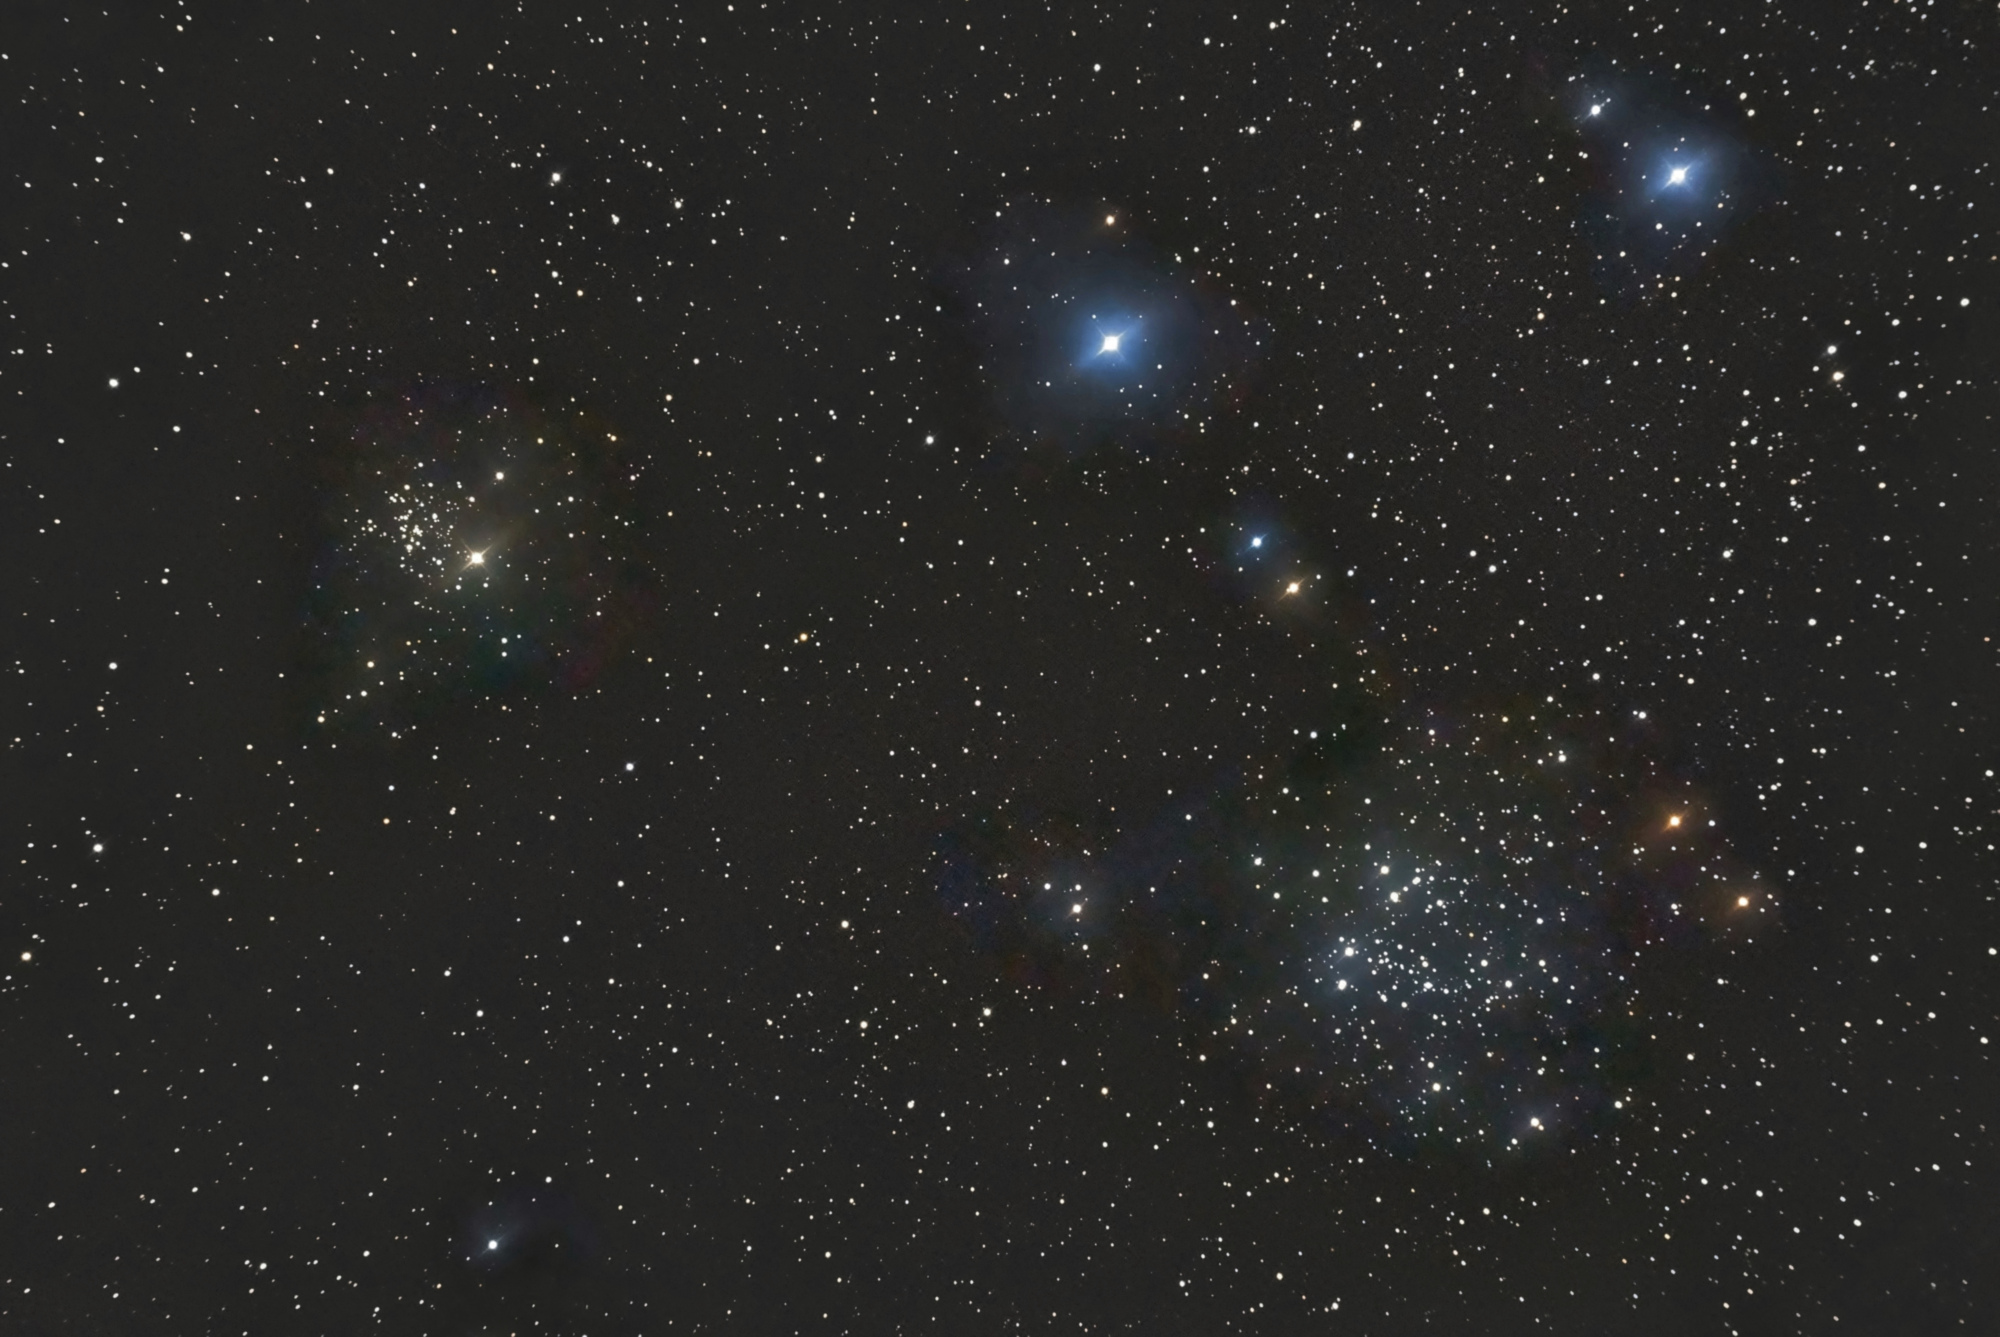 5f9be0ee55803_NGC663fin.thumb.jpg.3755f66956cc453b900fe9d774aa3fb6.jpg